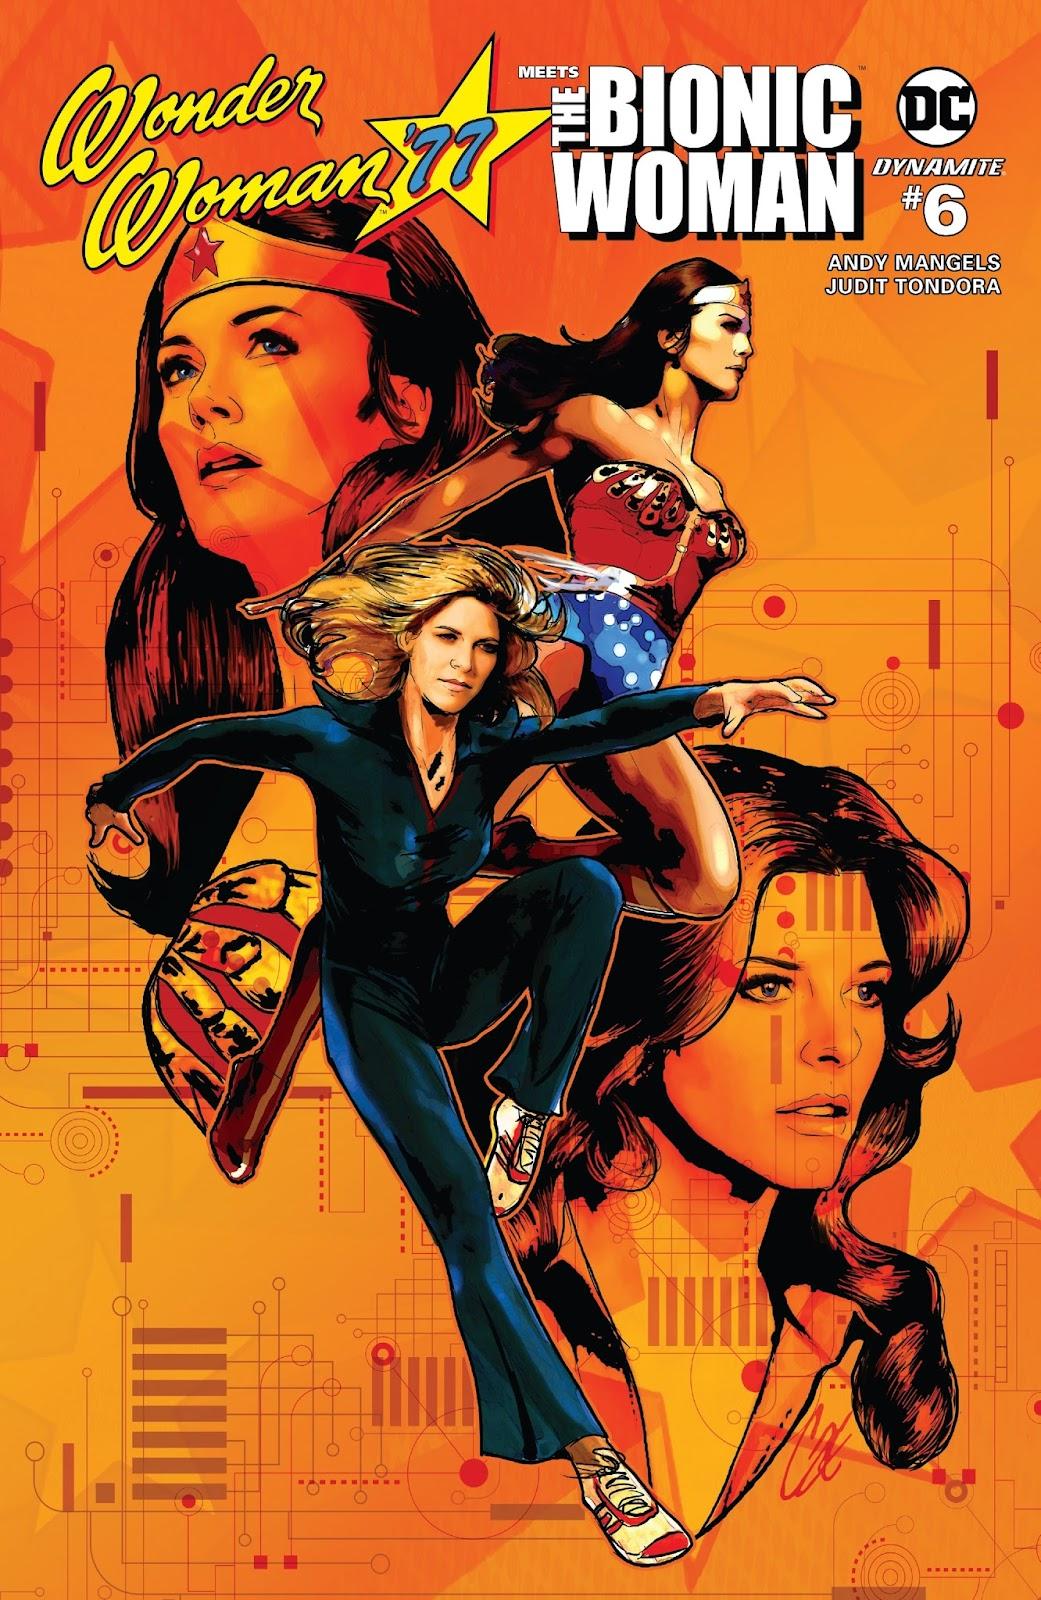 Wonder Woman 77 Meets The Bionic Woman 6 Page 1